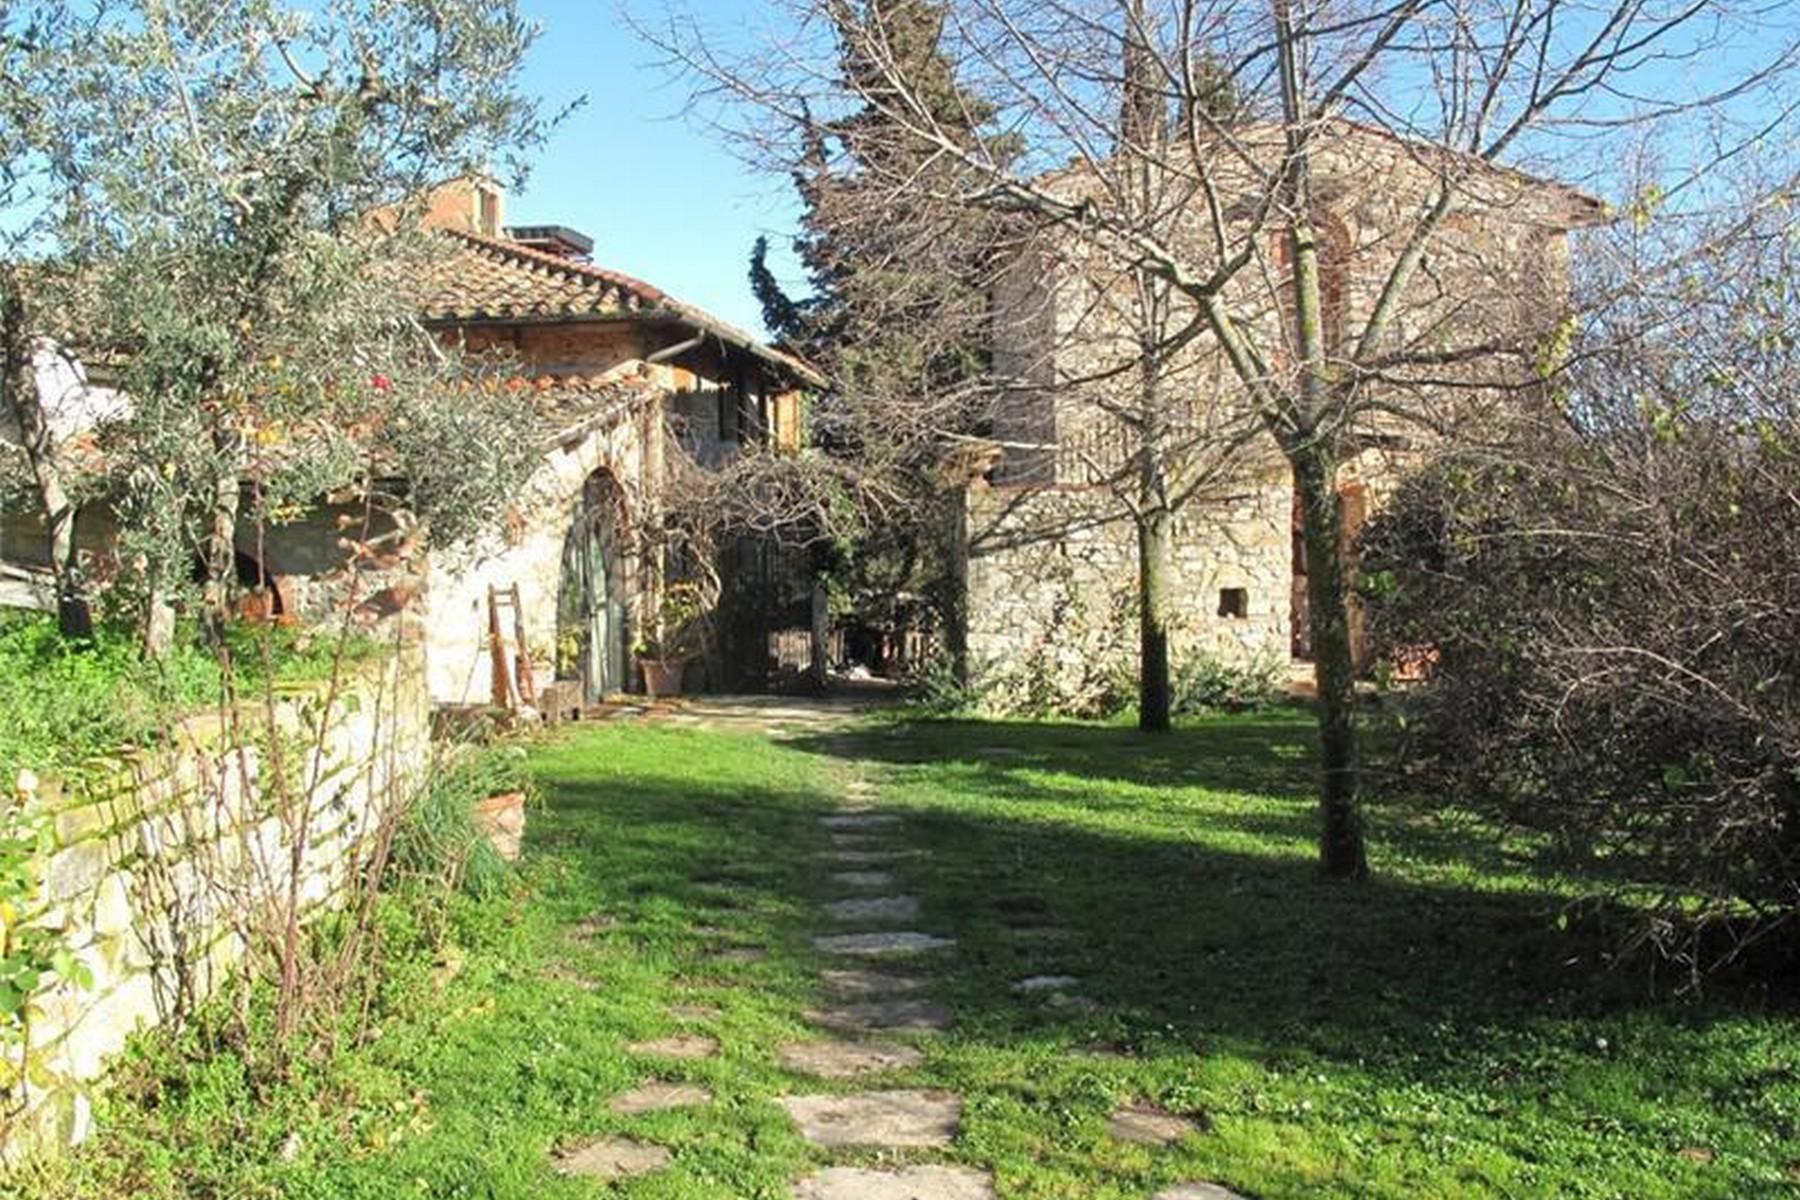 Villa in Vendita a Greve In Chianti: 5 locali, 400 mq - Foto 2